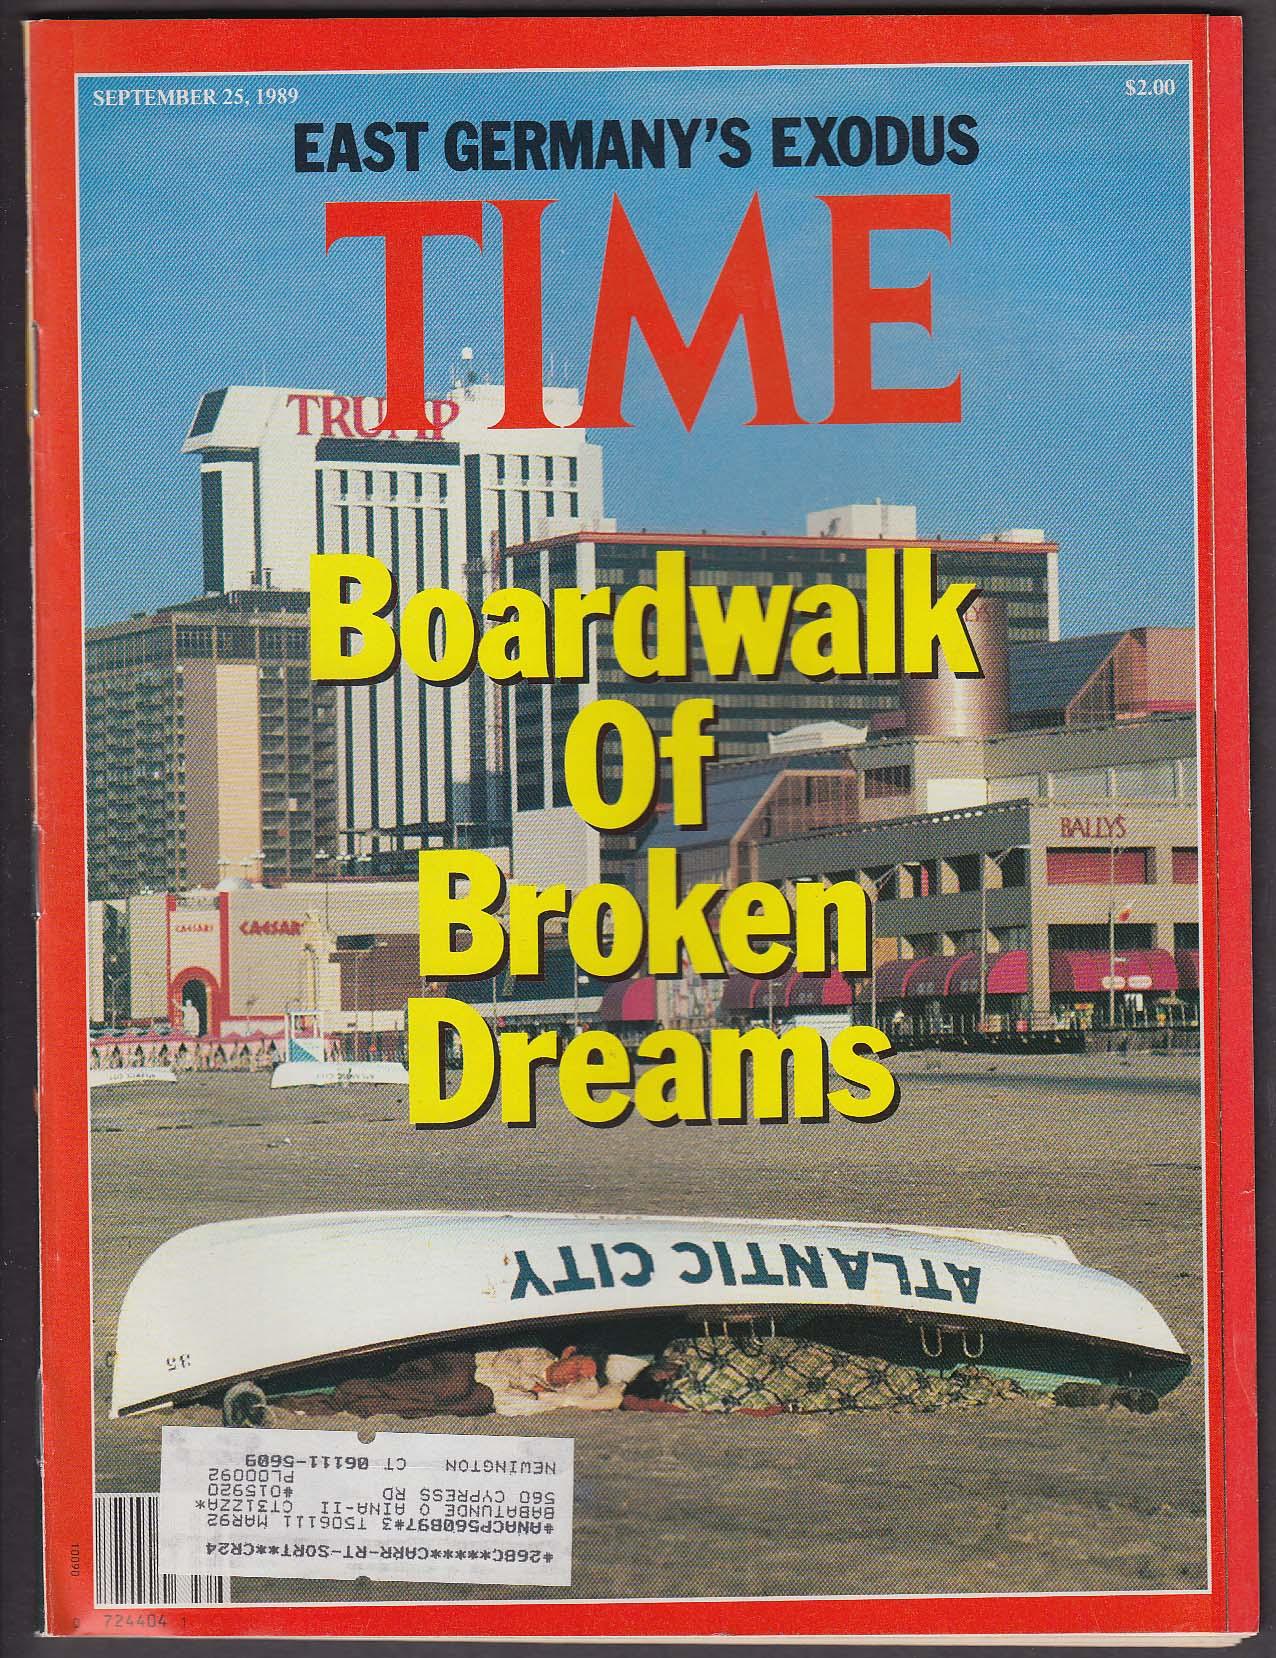 TIME Atlantic City David Dinkins East German Exodus + 9/25 1989